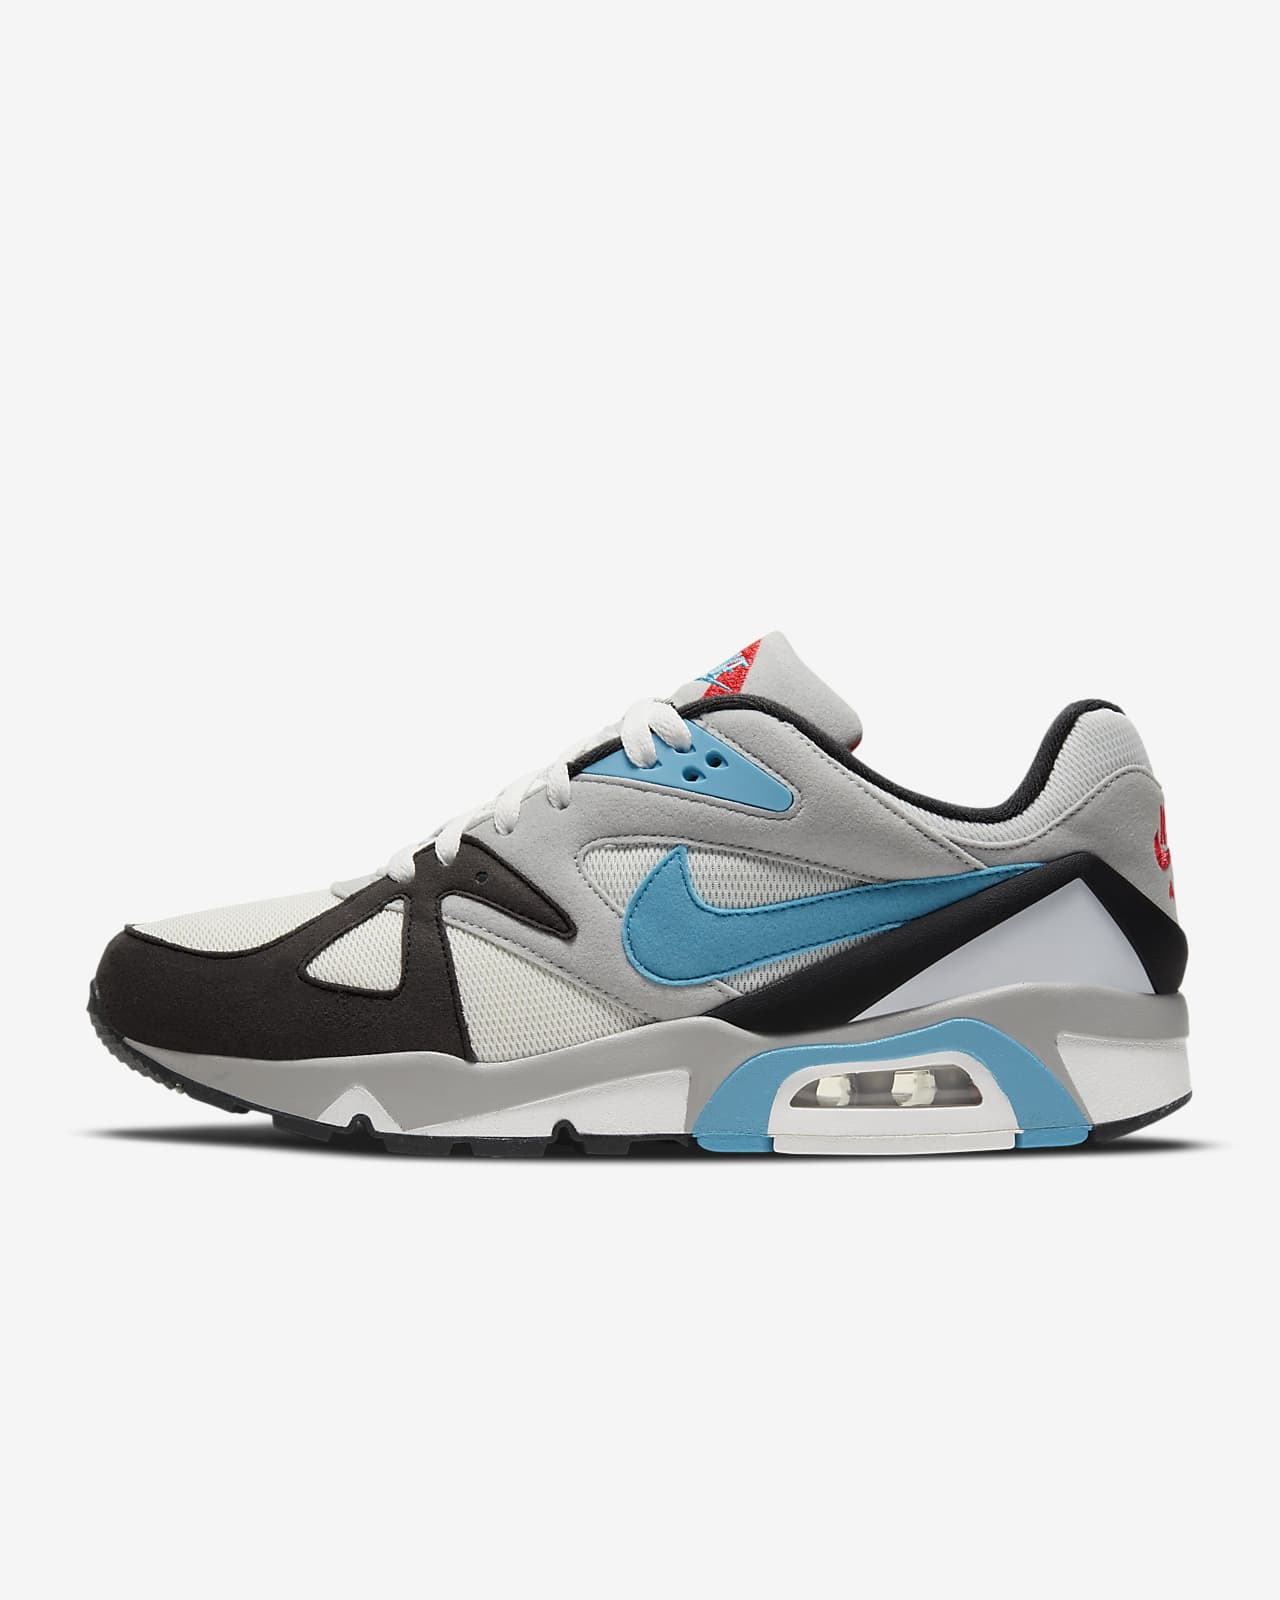 NIke Air Structure OG Men's Shoes